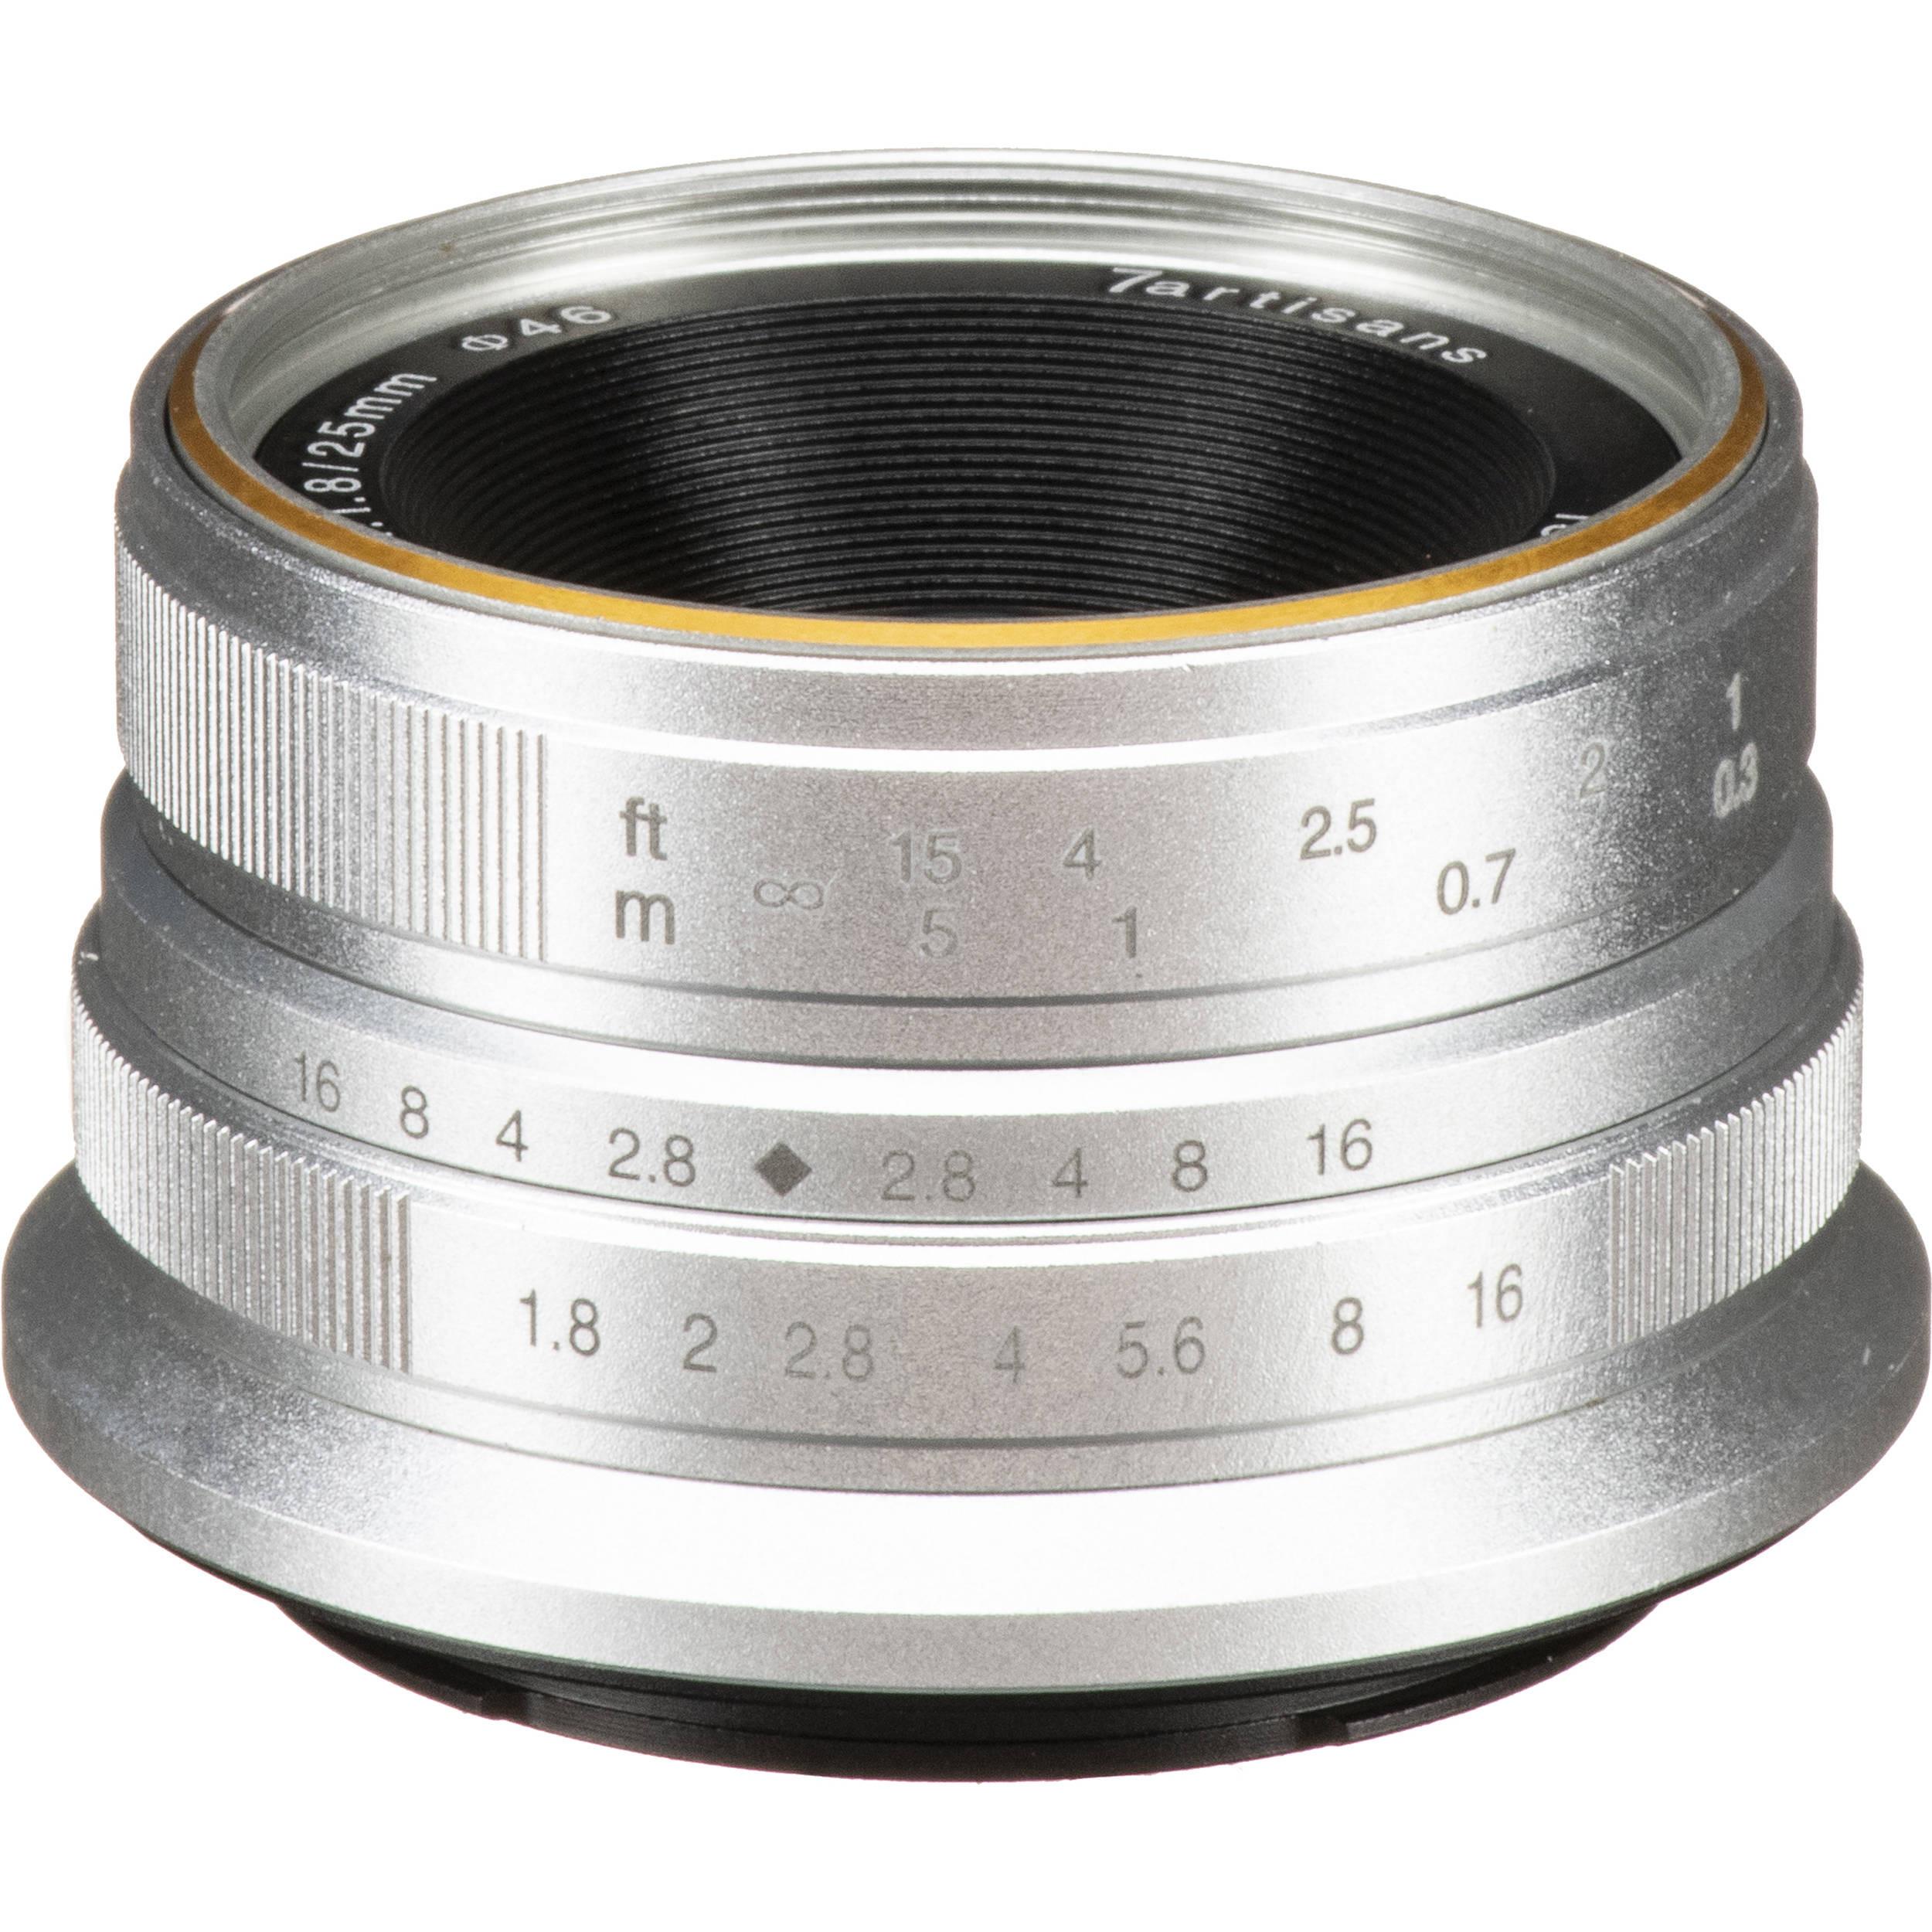 7Artisans 25mm f/1.8 Manual Focus Lens (Canon M) Silver